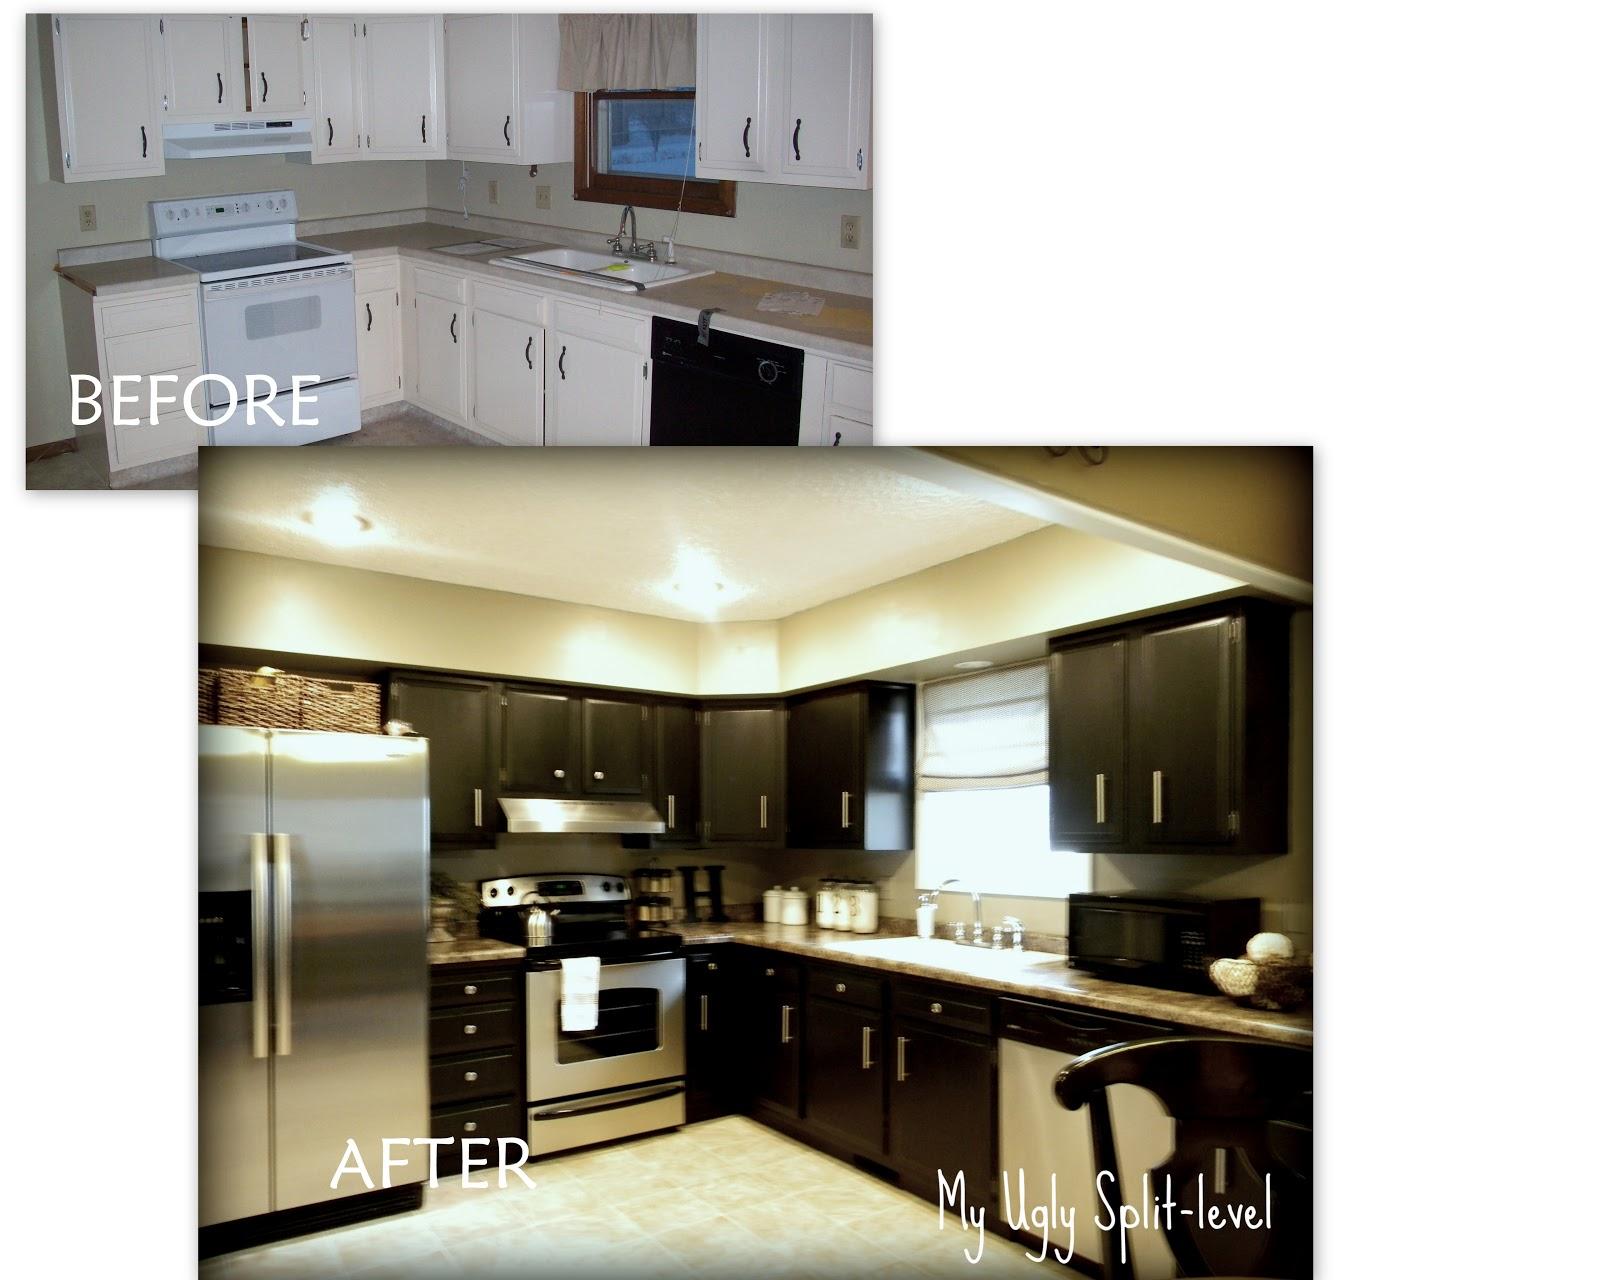 the kitchen split level kitchen remodel Phase 1 The Cabinets